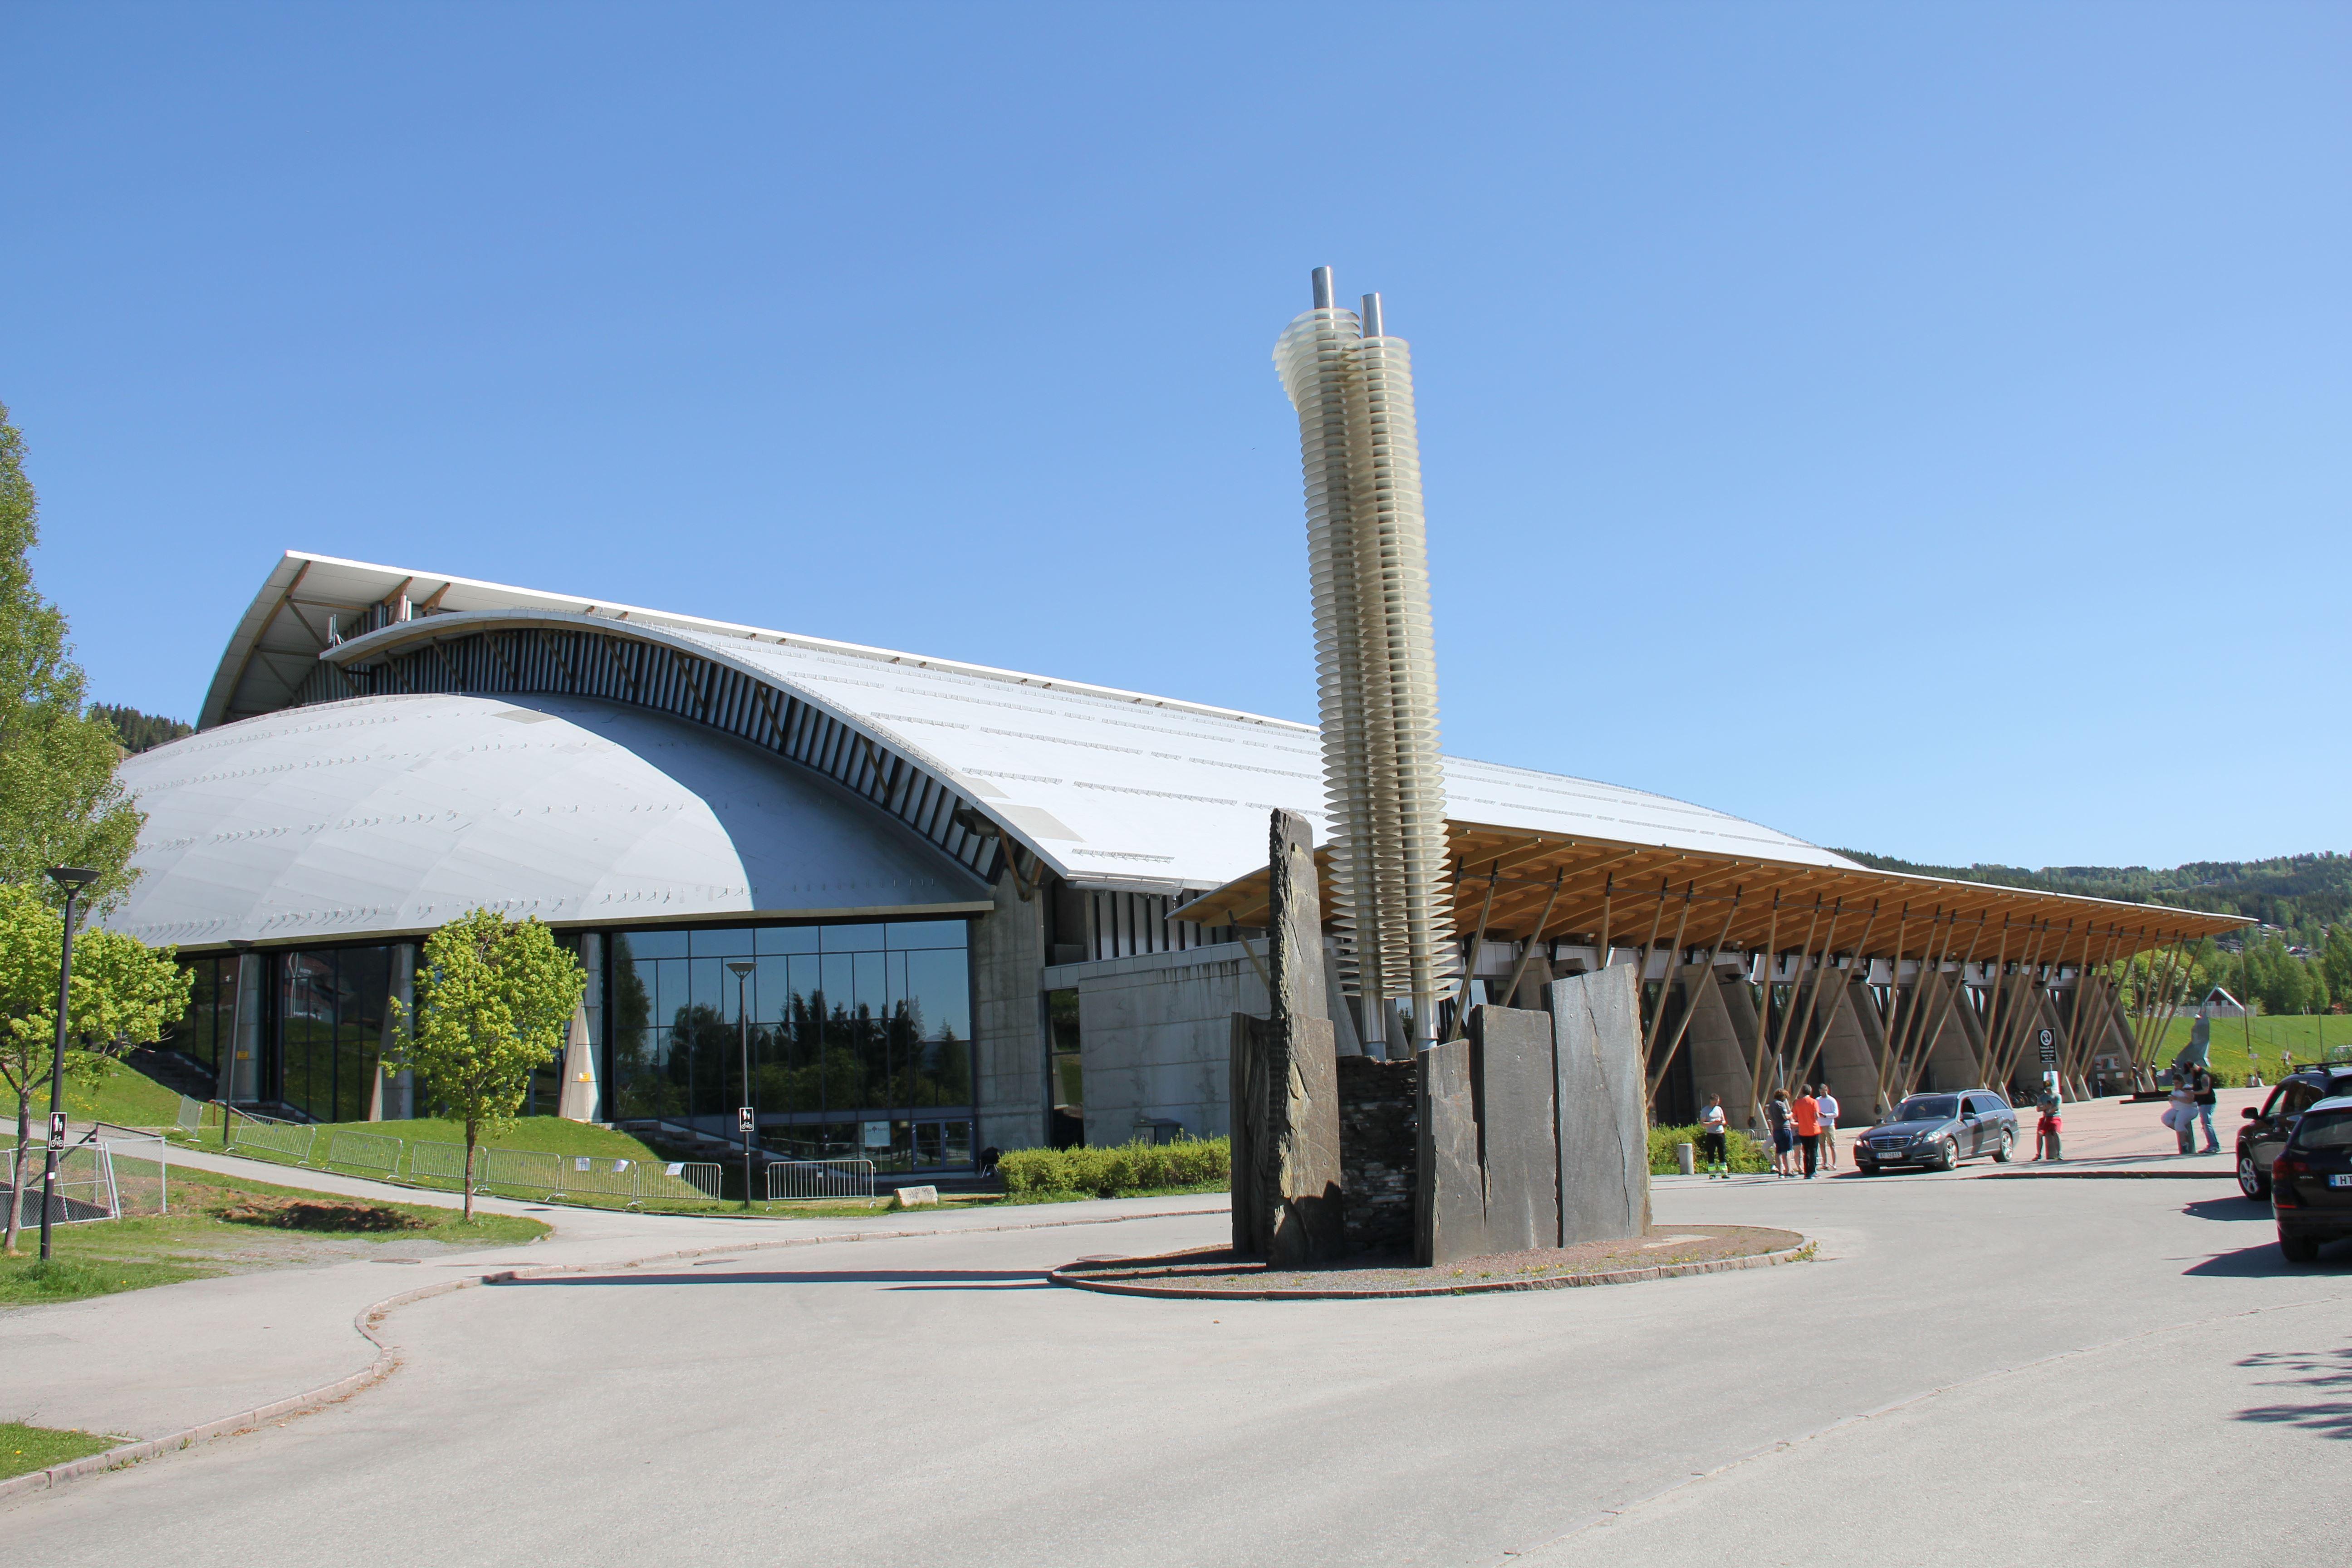 Oppland trophy in Lillehammer